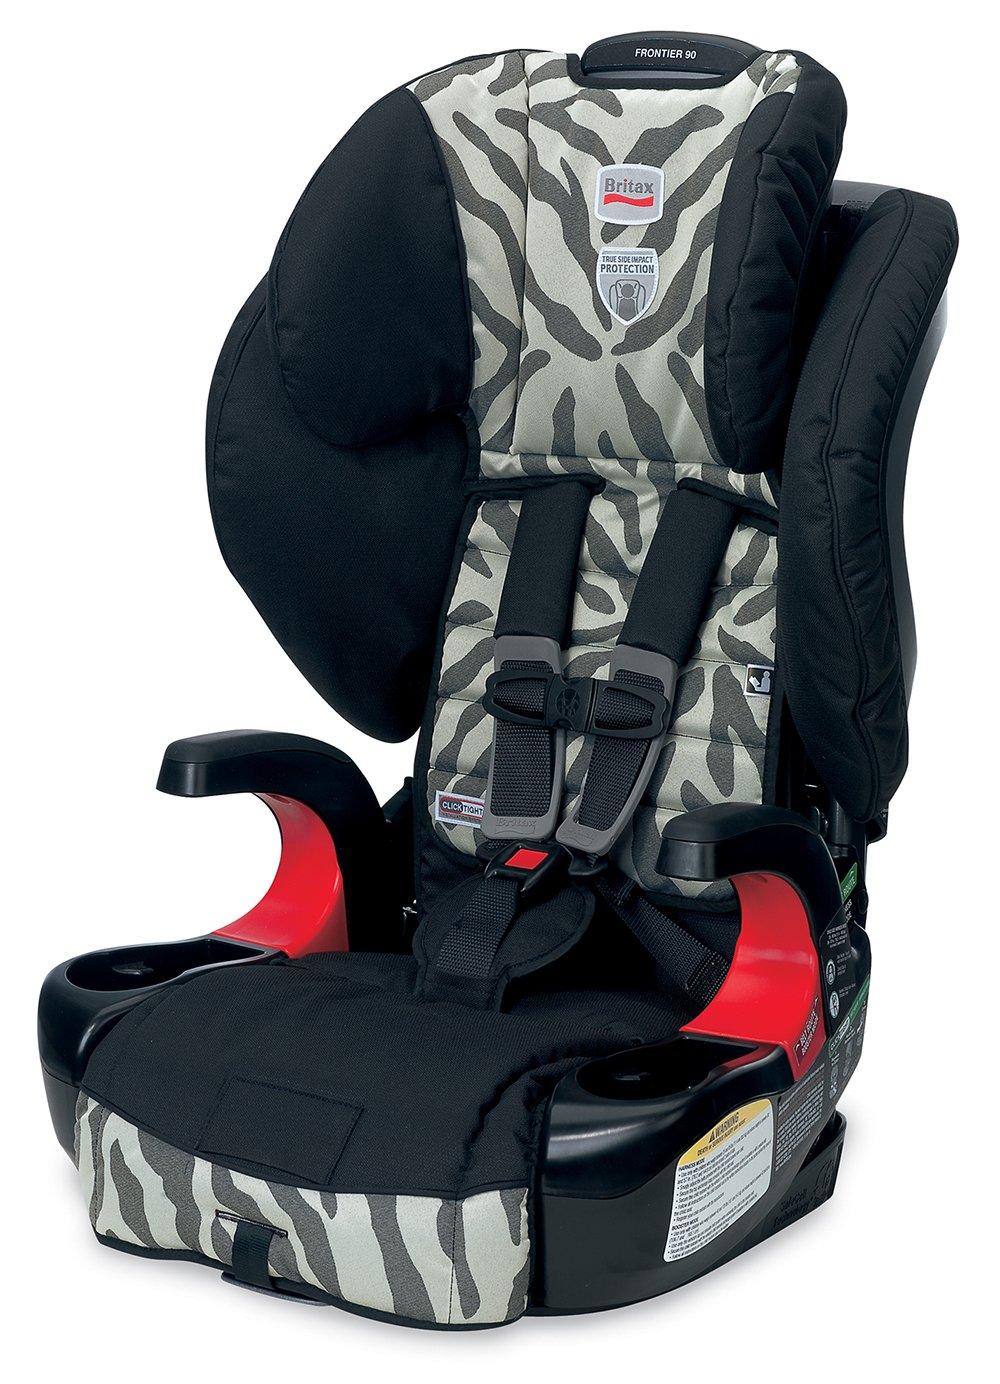 amazon com britax frontier 90 booster car seat zebra older rh amazon com britax frontier 90 user manual Britax Frontier 85 vs 90